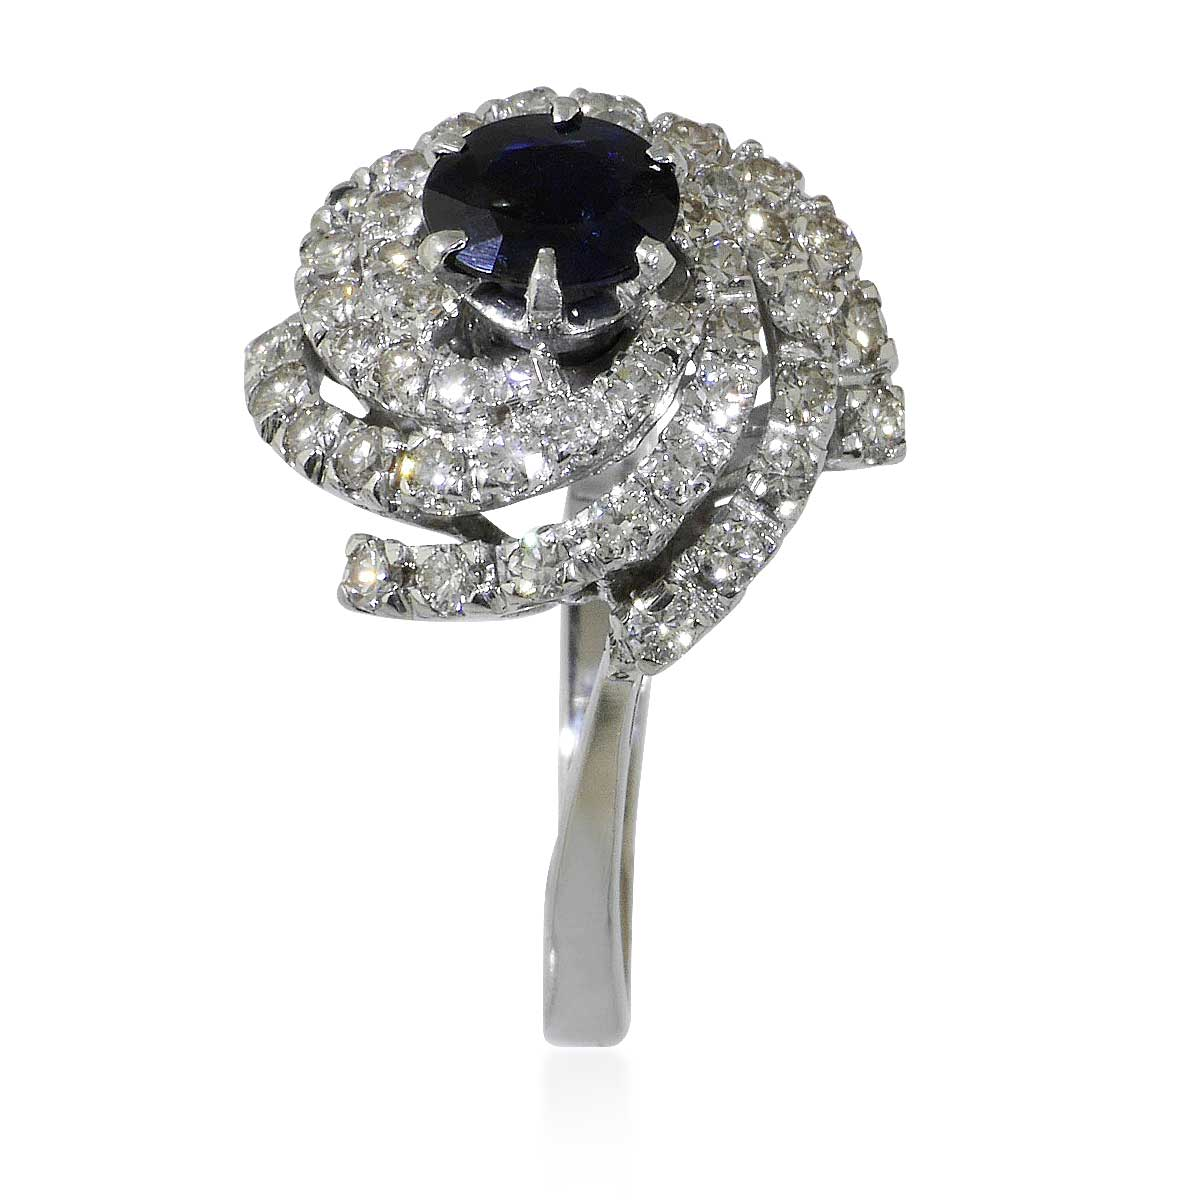 saphir diamant ring mit 1 42ct saphir und 1 73ct diamanten. Black Bedroom Furniture Sets. Home Design Ideas